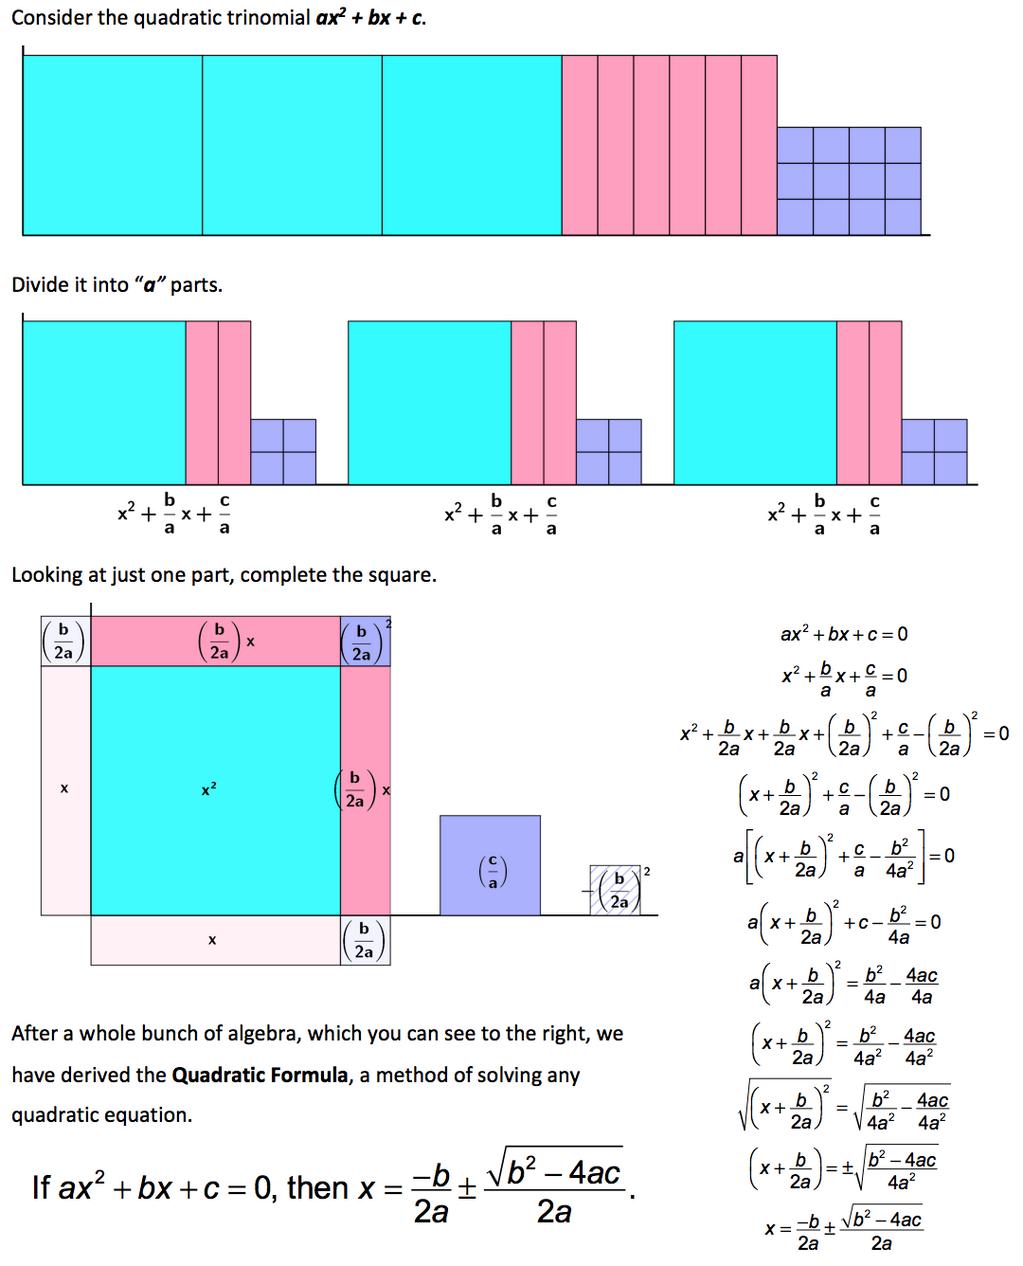 Deriving the Quadratic Formula with Algebra Tiles - sort of ...